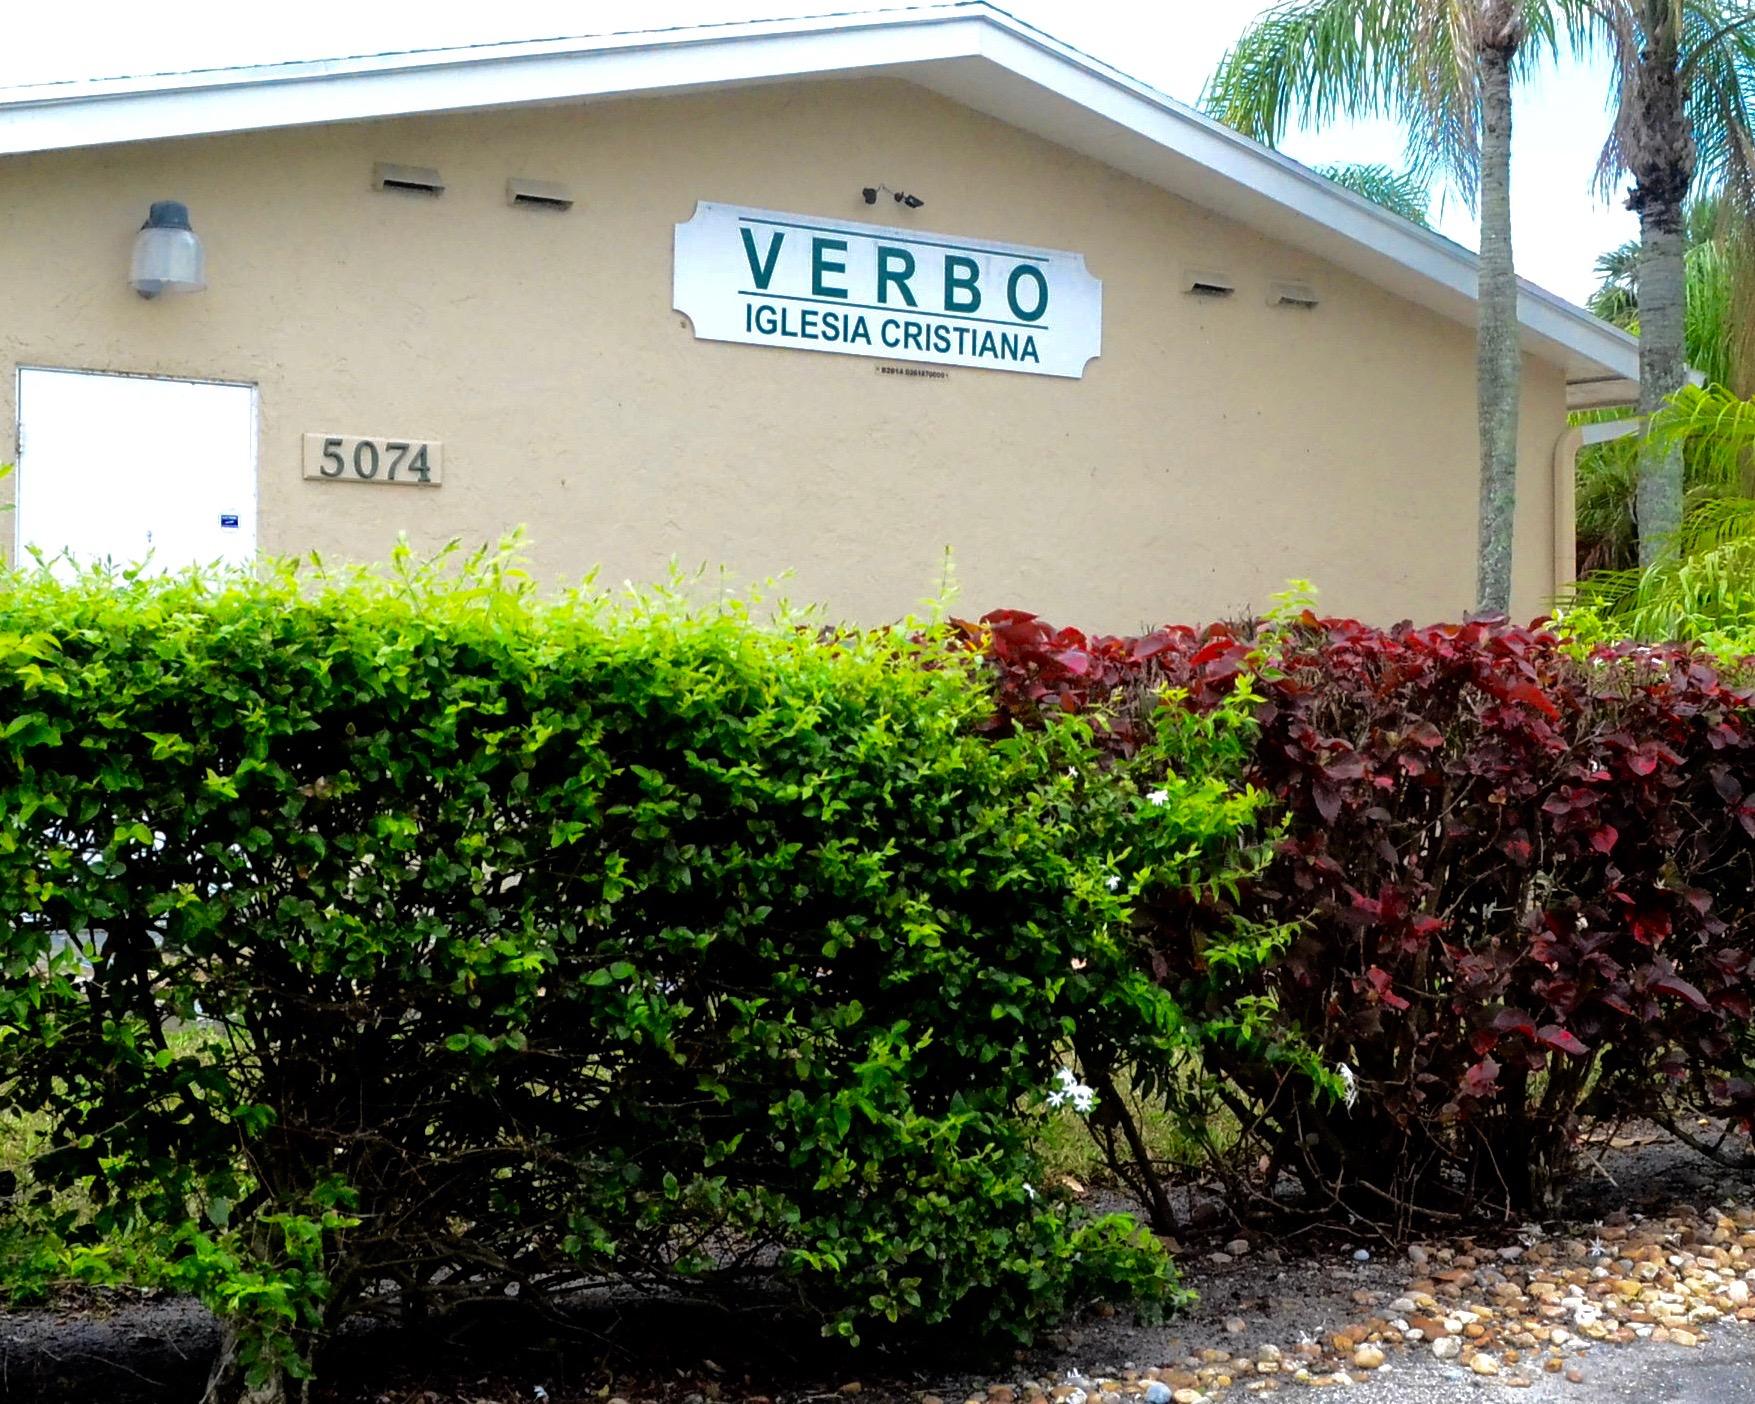 IGLESIA CRISTIANA VERBO WEST PALM BEACH   5074 Palm Beach Canal RD. West Palm Beach, Fl 33415